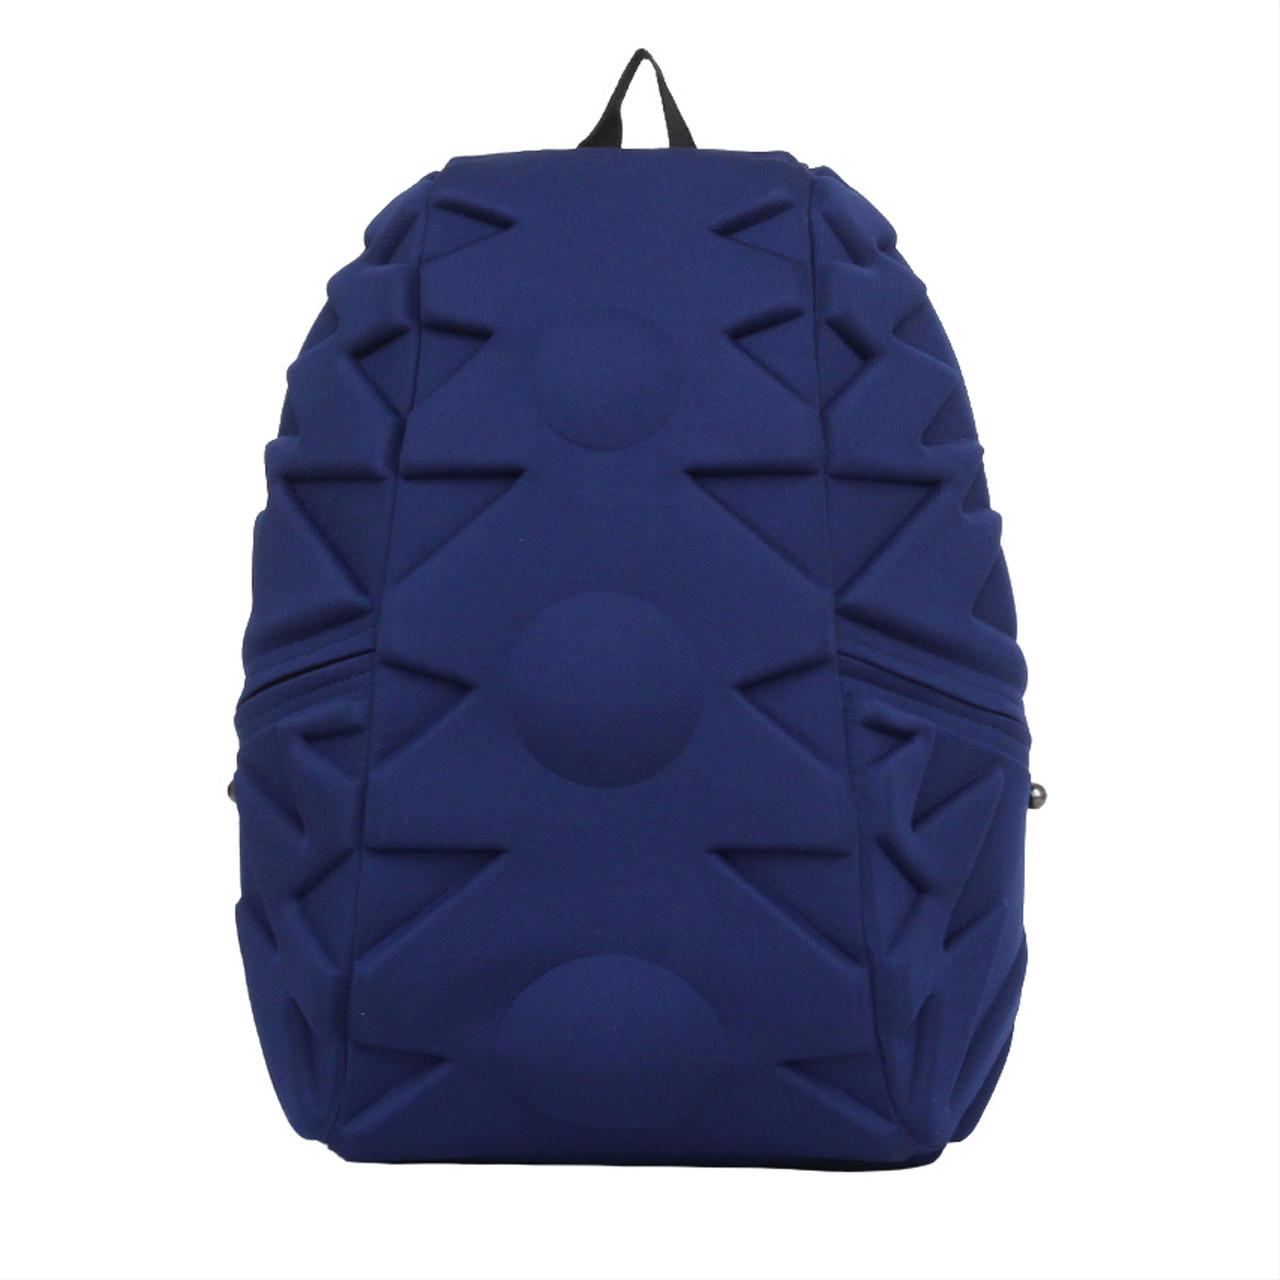 Рюкзак MadPax Exo Full цвет Navy (синий)